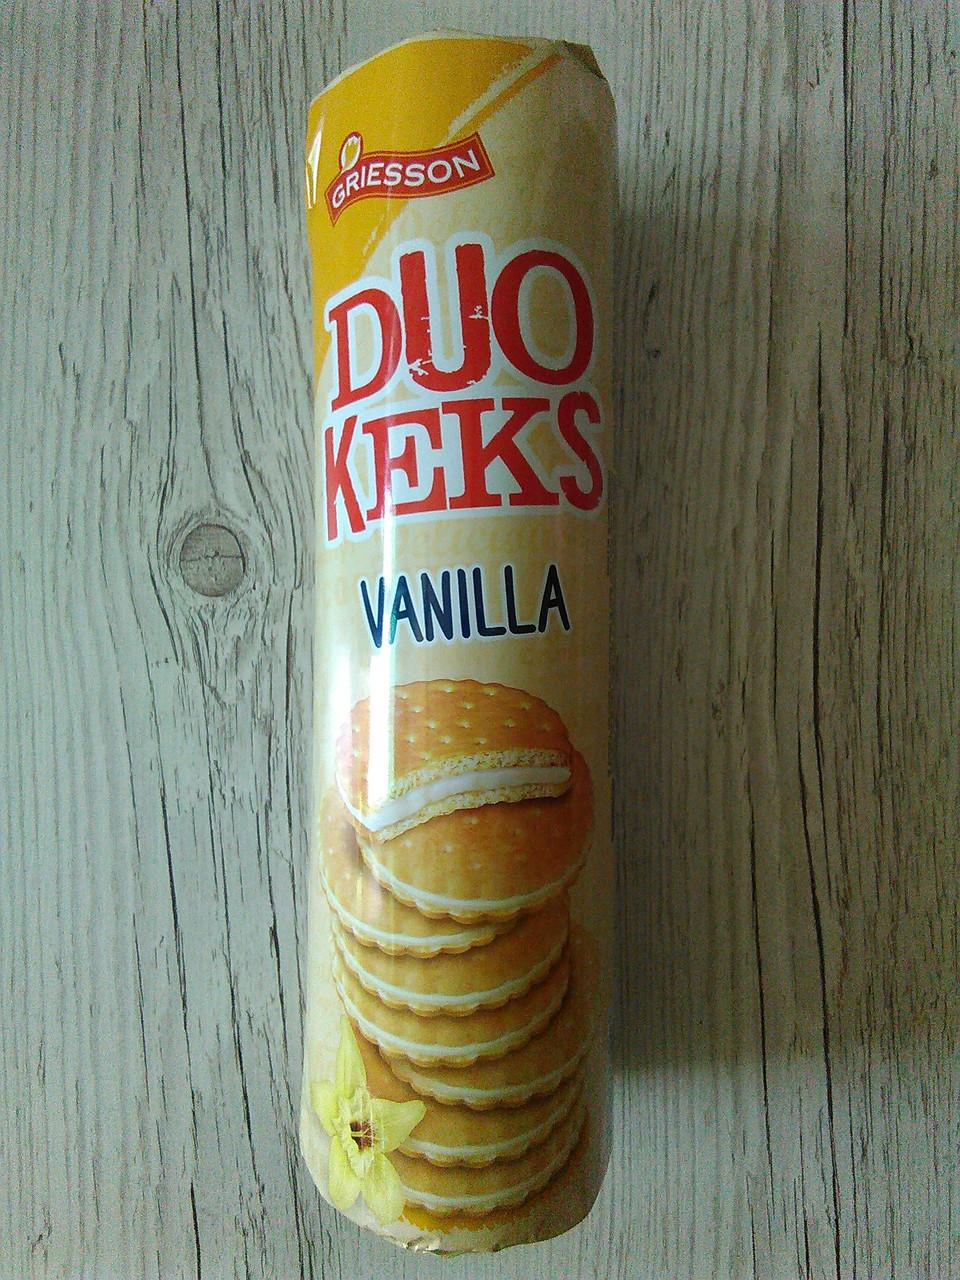 Бисквитное печенье Griesson Duo Keks Vanilla, 500г